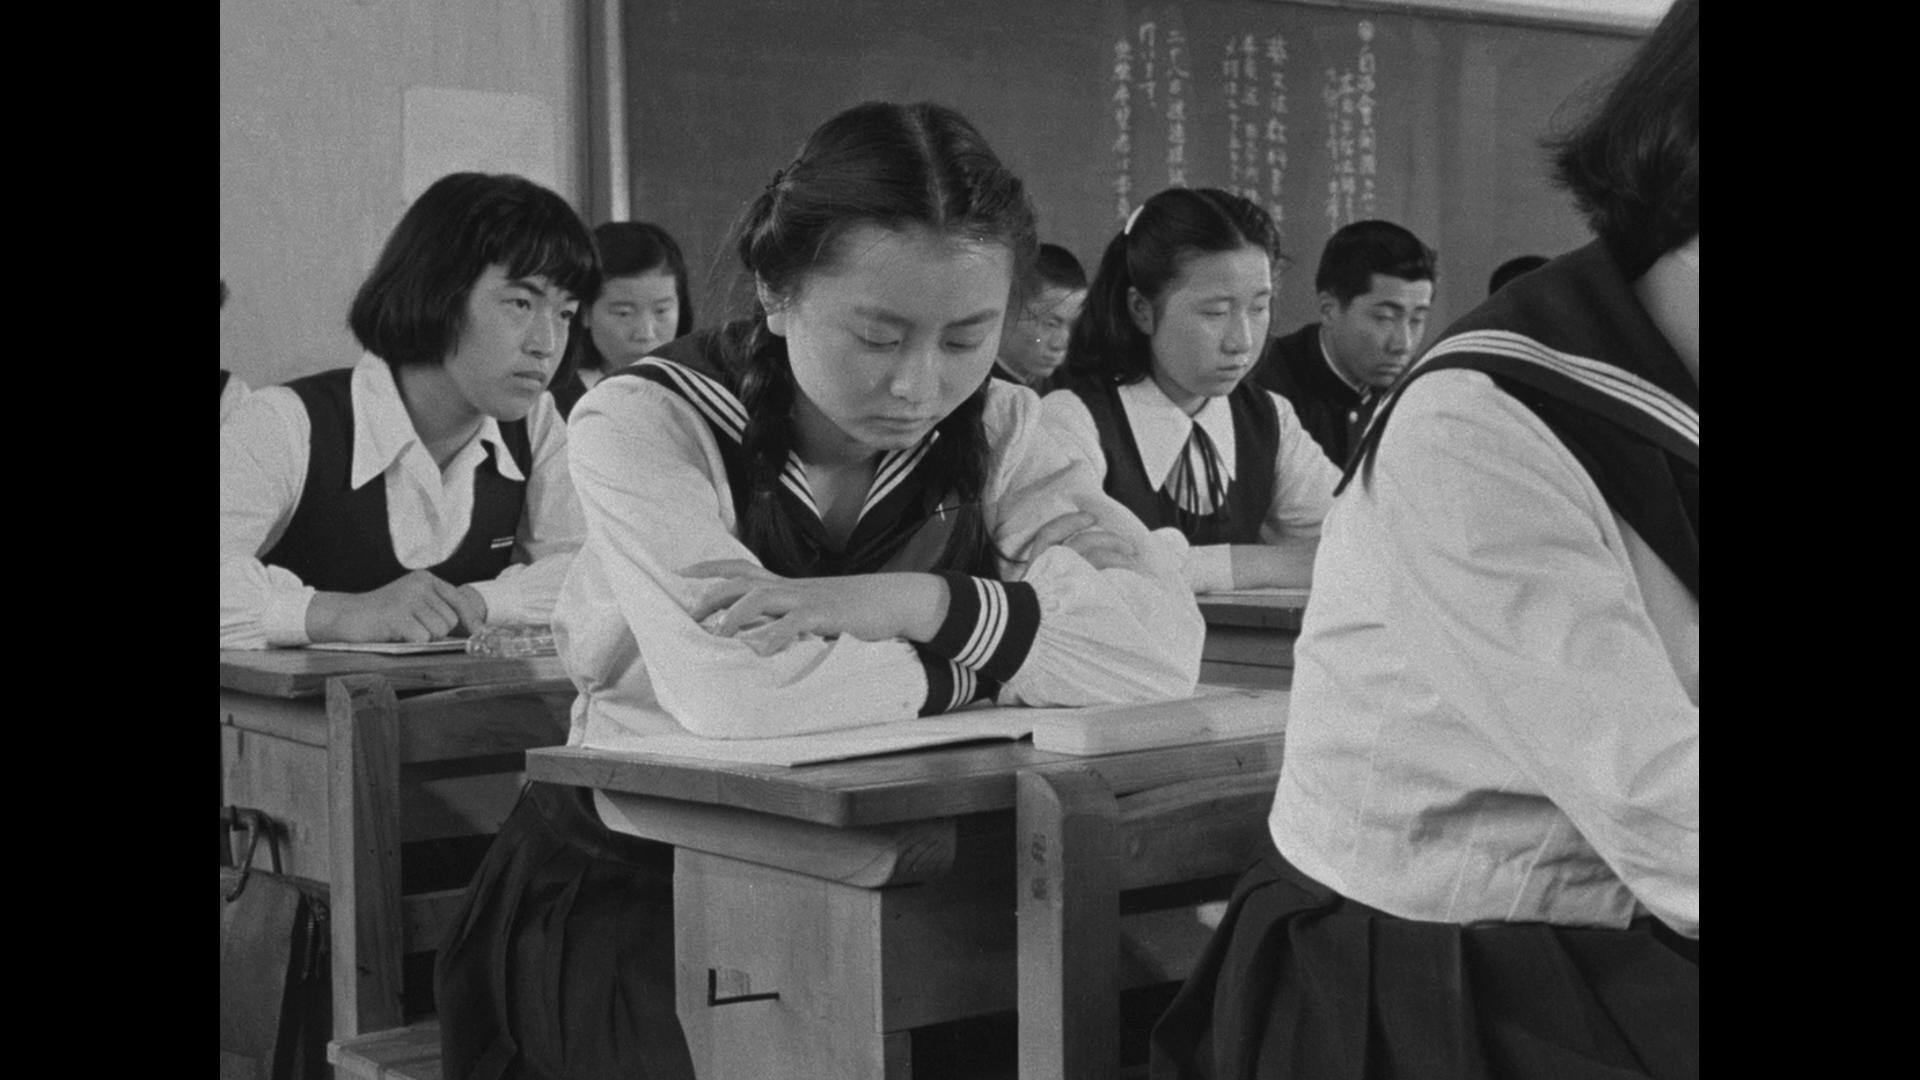 Hiroshima [Arrow Films Blu-ray review] 2